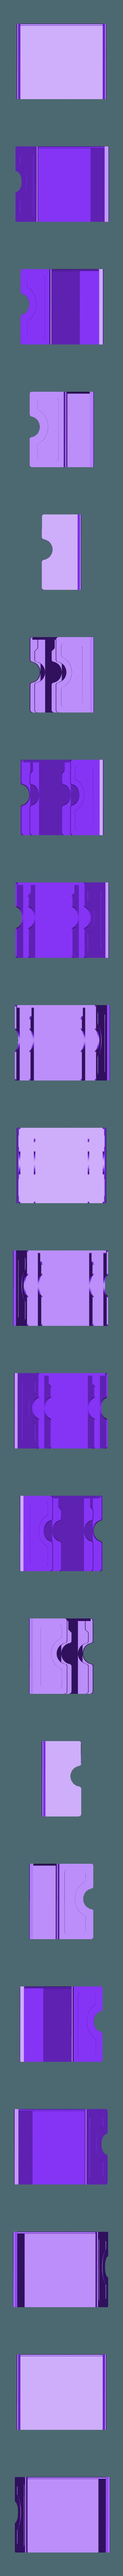 73TRK_tray.stl Download STL file Ratrod Pickup • 3D printing template, macone1